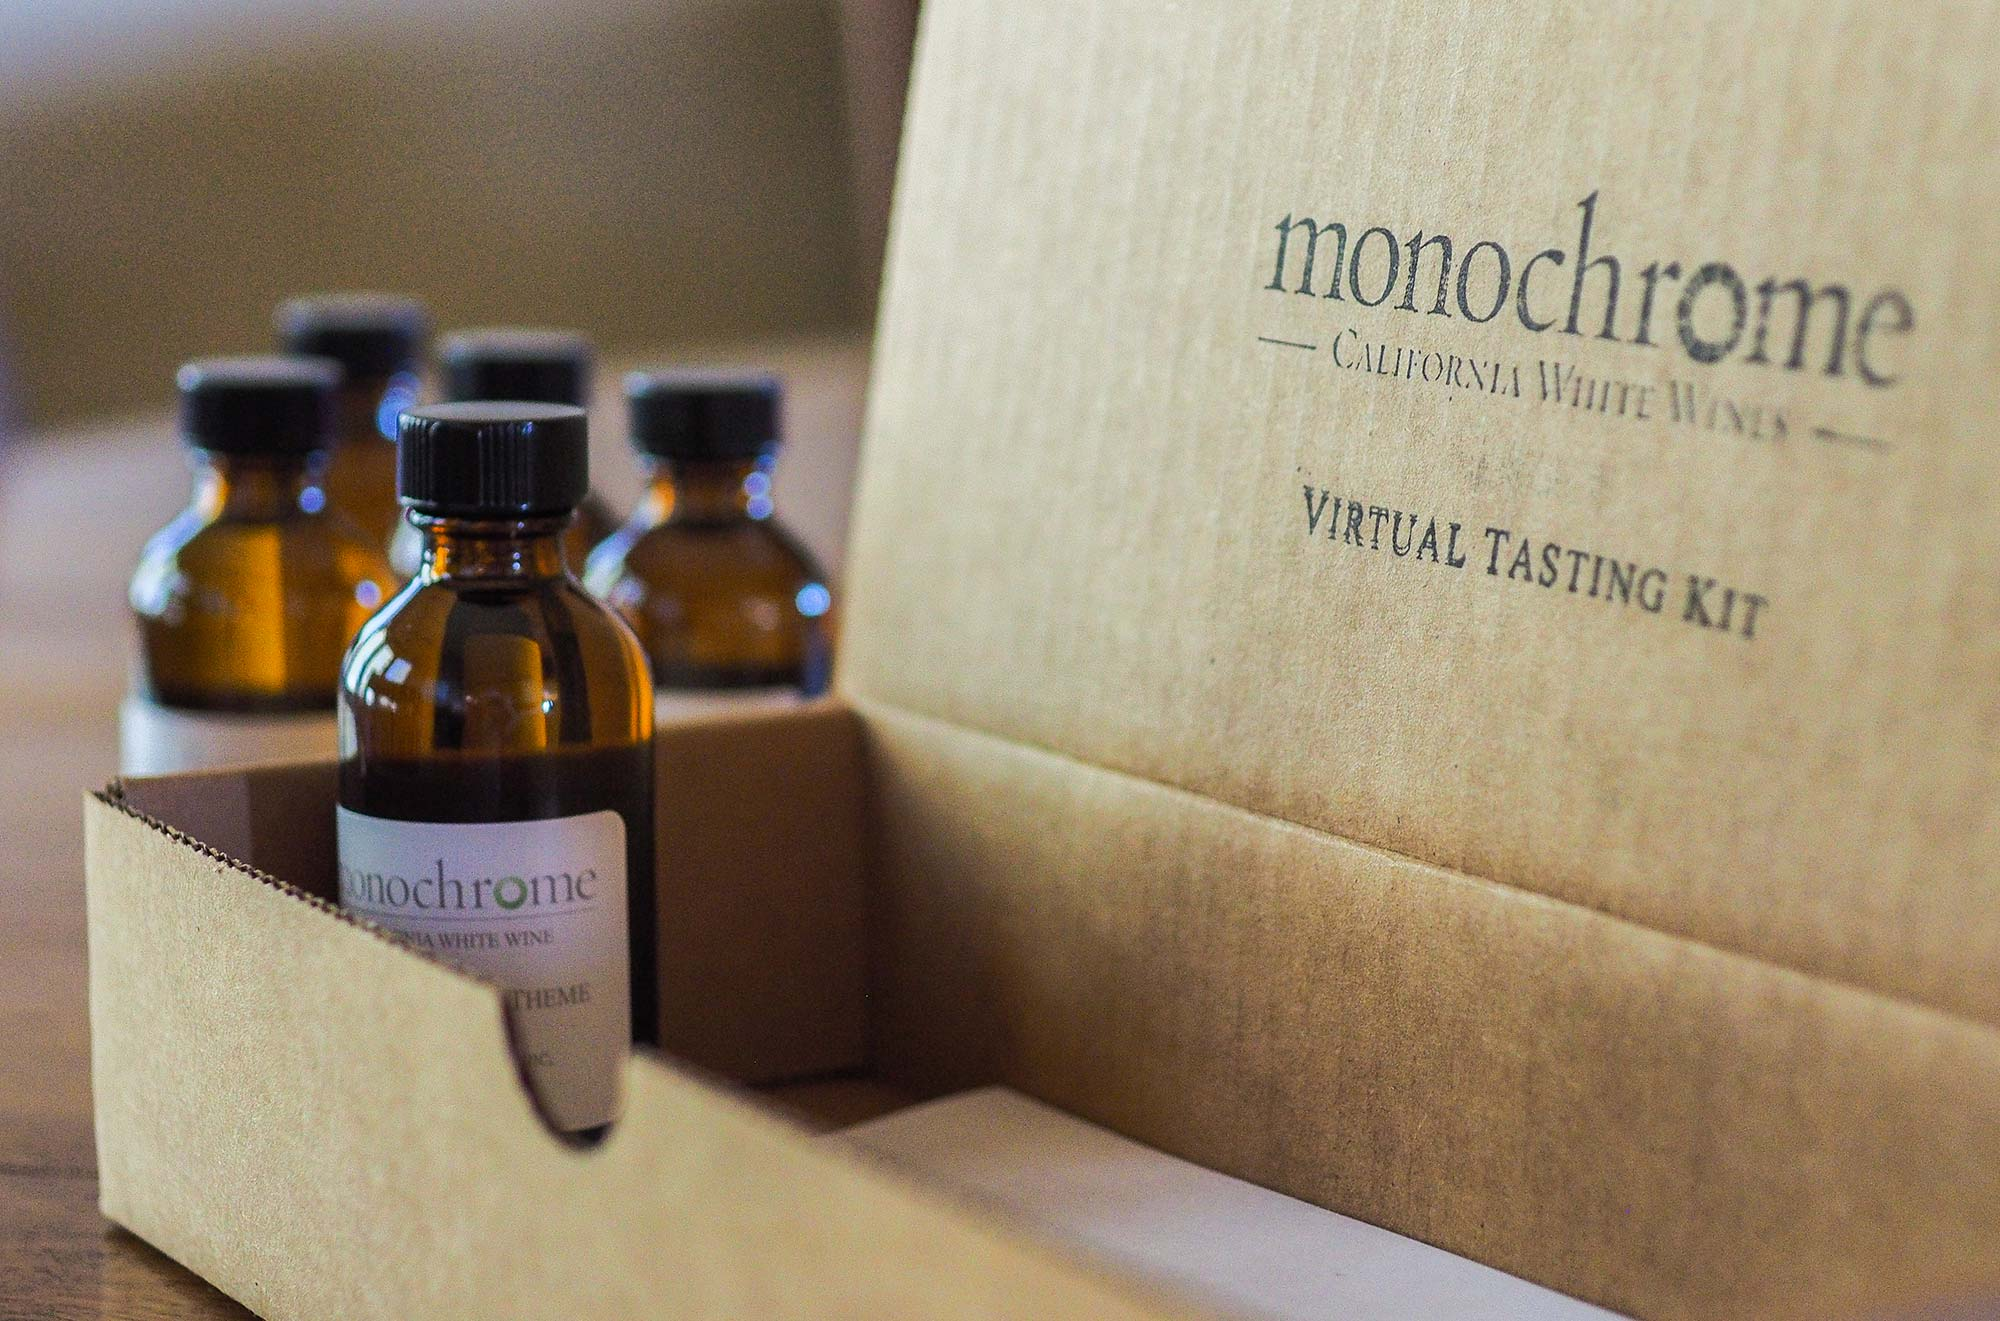 Monochrome Wines Virtual Tasting Kit Box